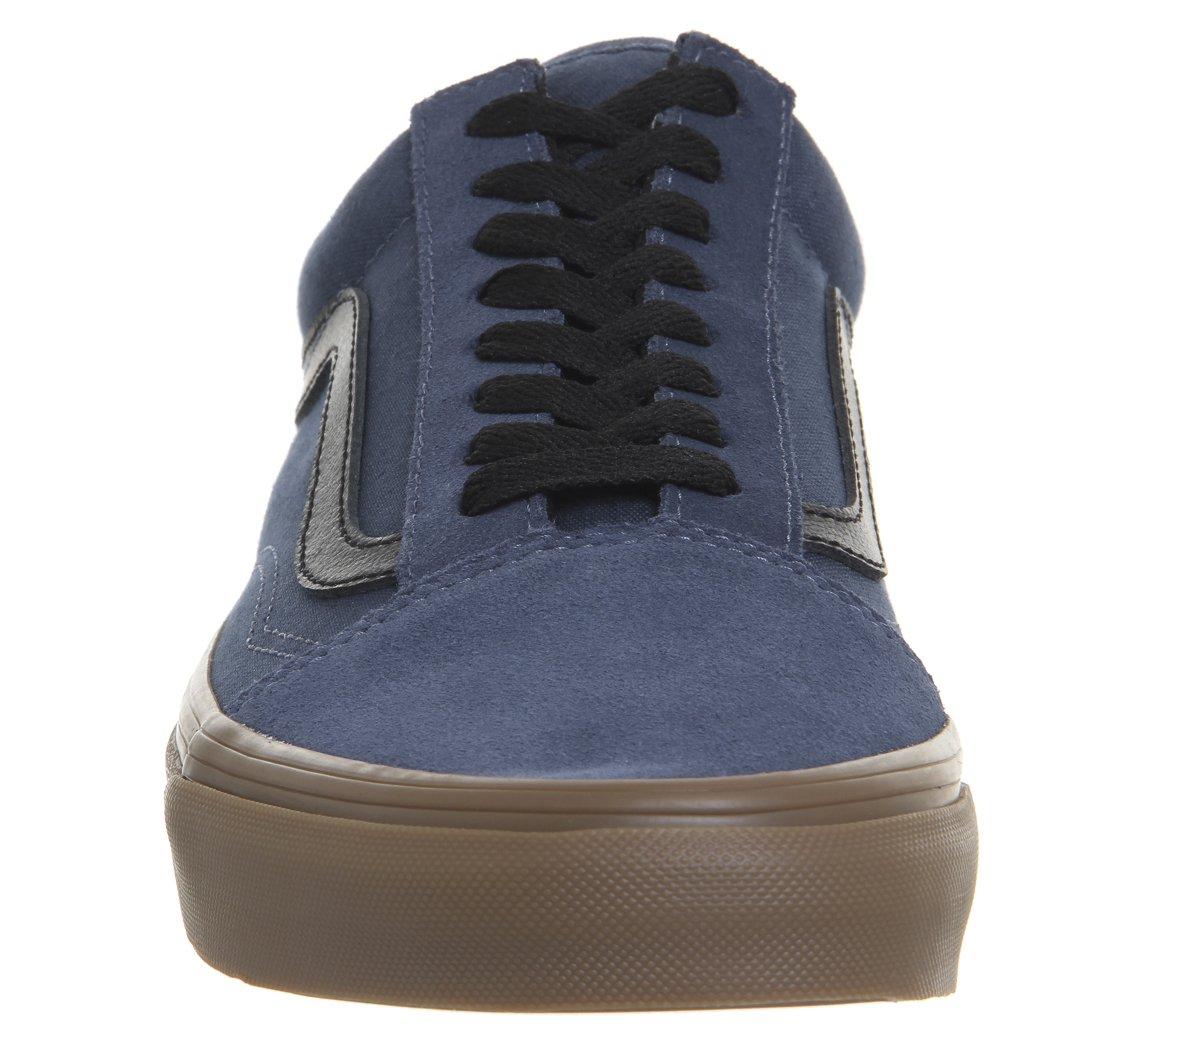 Vans Unisex Old Skool Classic Skate Shoes B078YCDGHV Boys/Mens 10 Dark Denim/Gum